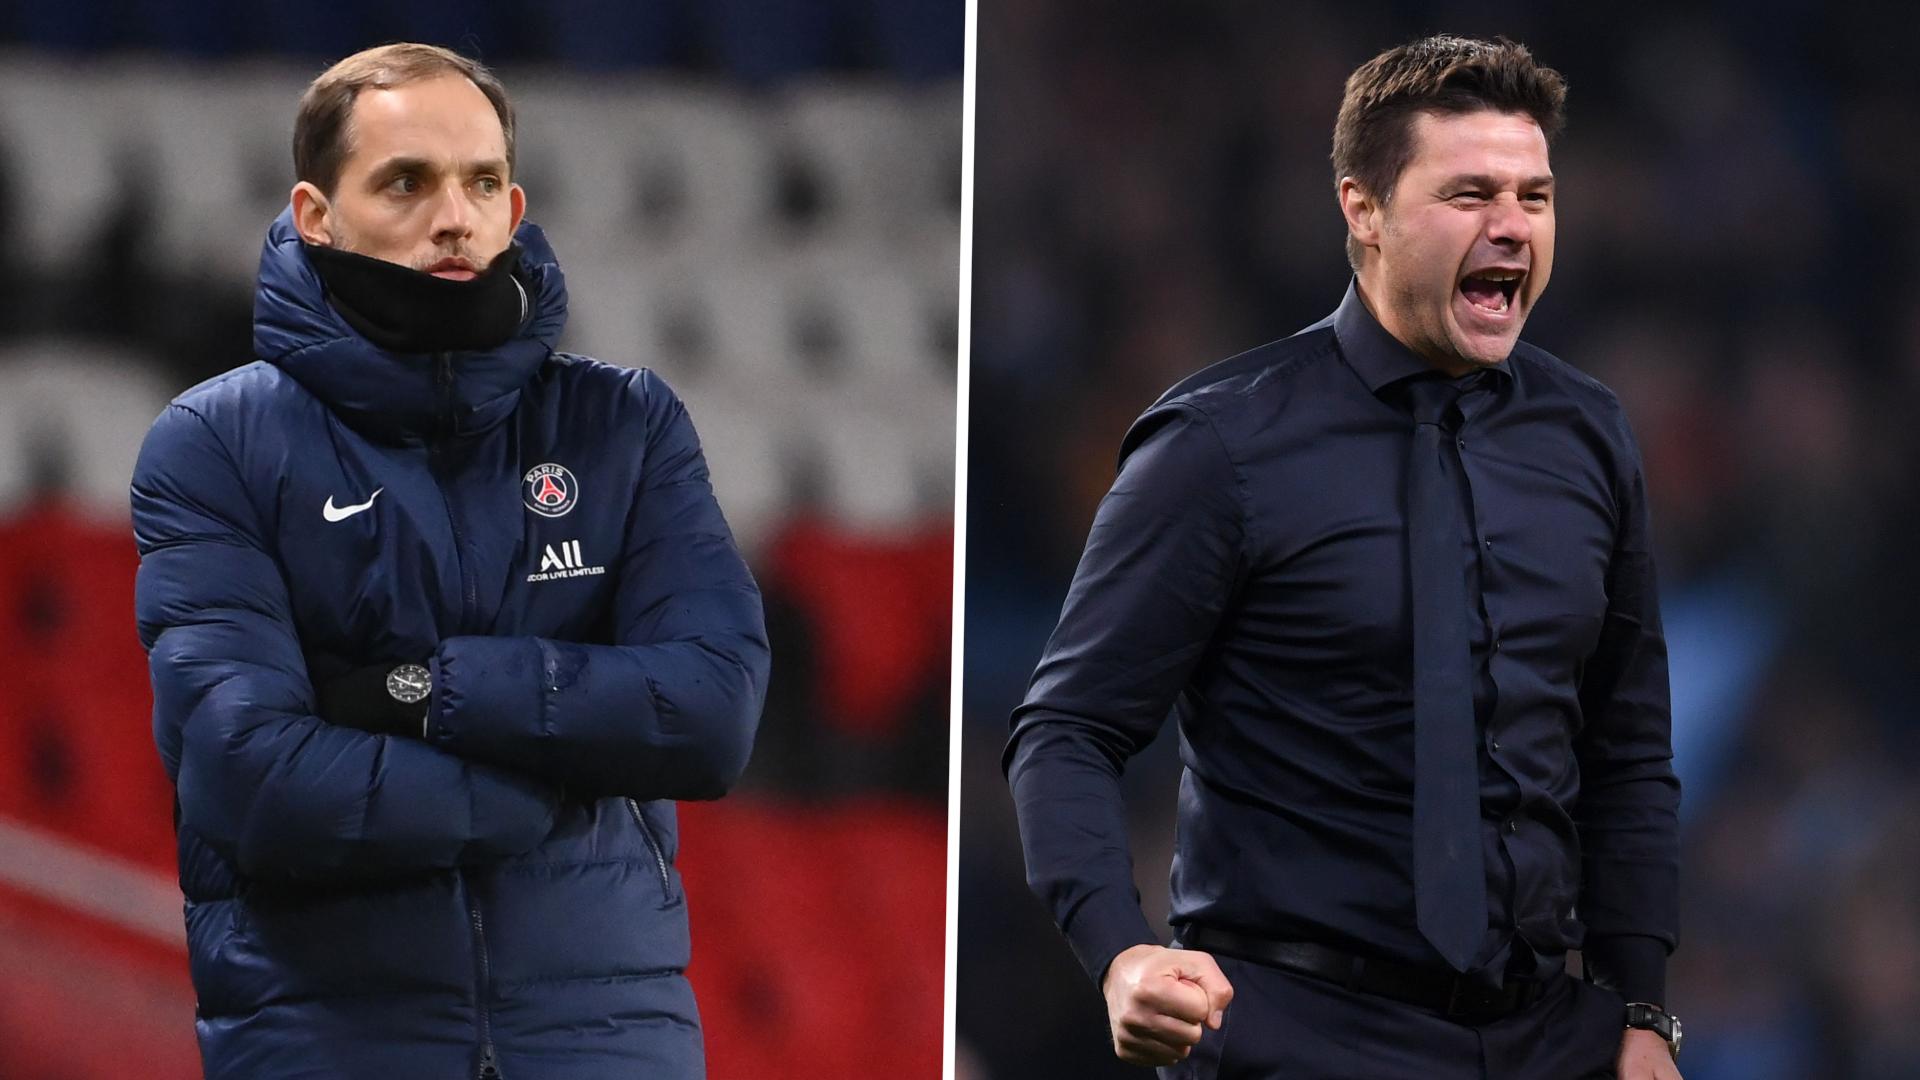 'Pochettino already belongs to the PSG family' - Ex-Tottenham boss 'ticks all the boxes' to replace Tuchel, says Domi